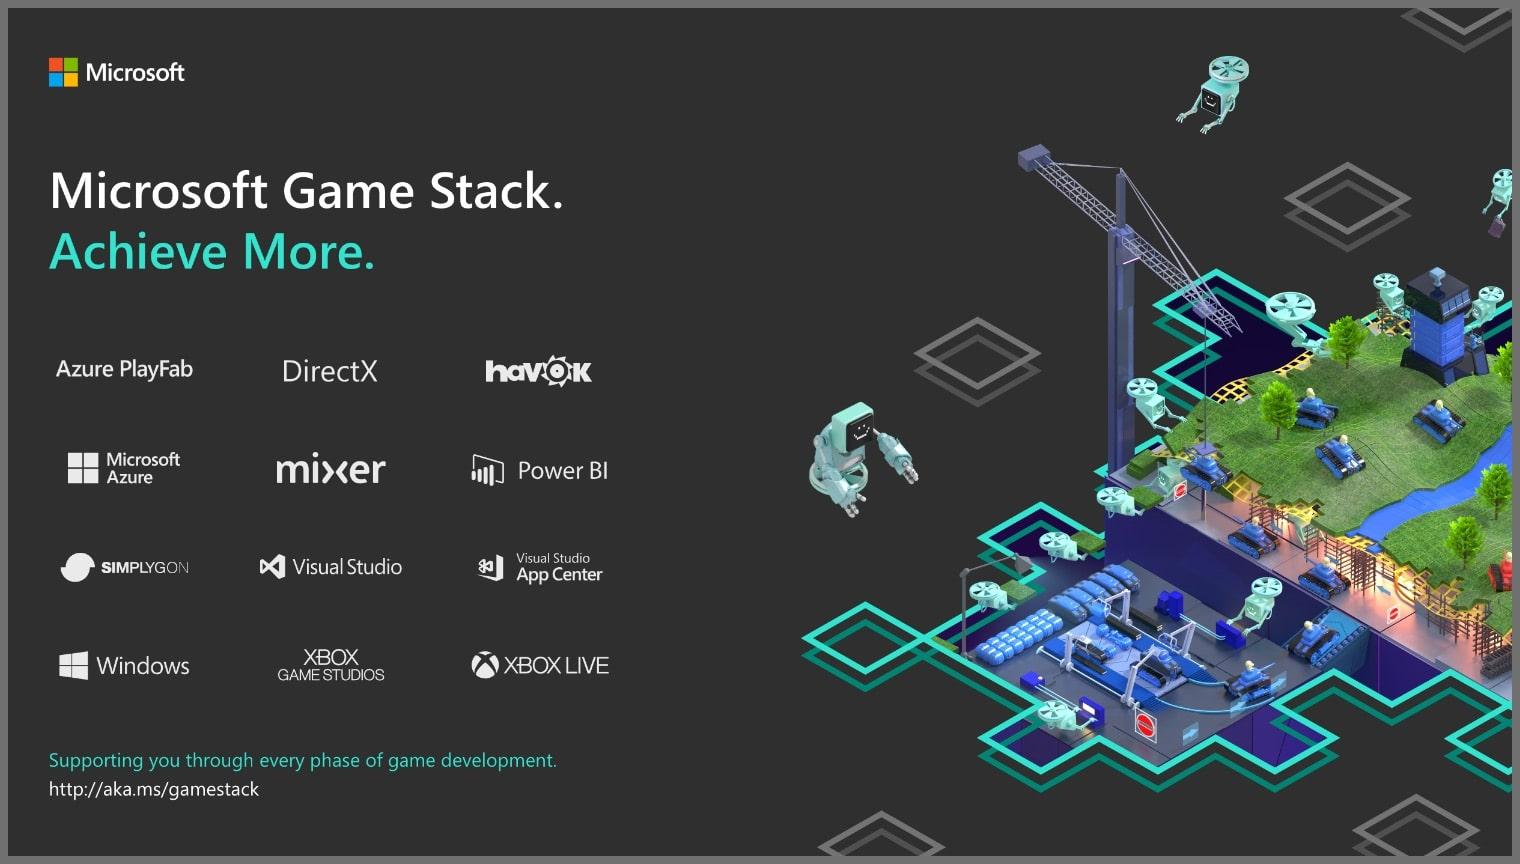 Microsoft Game Stack